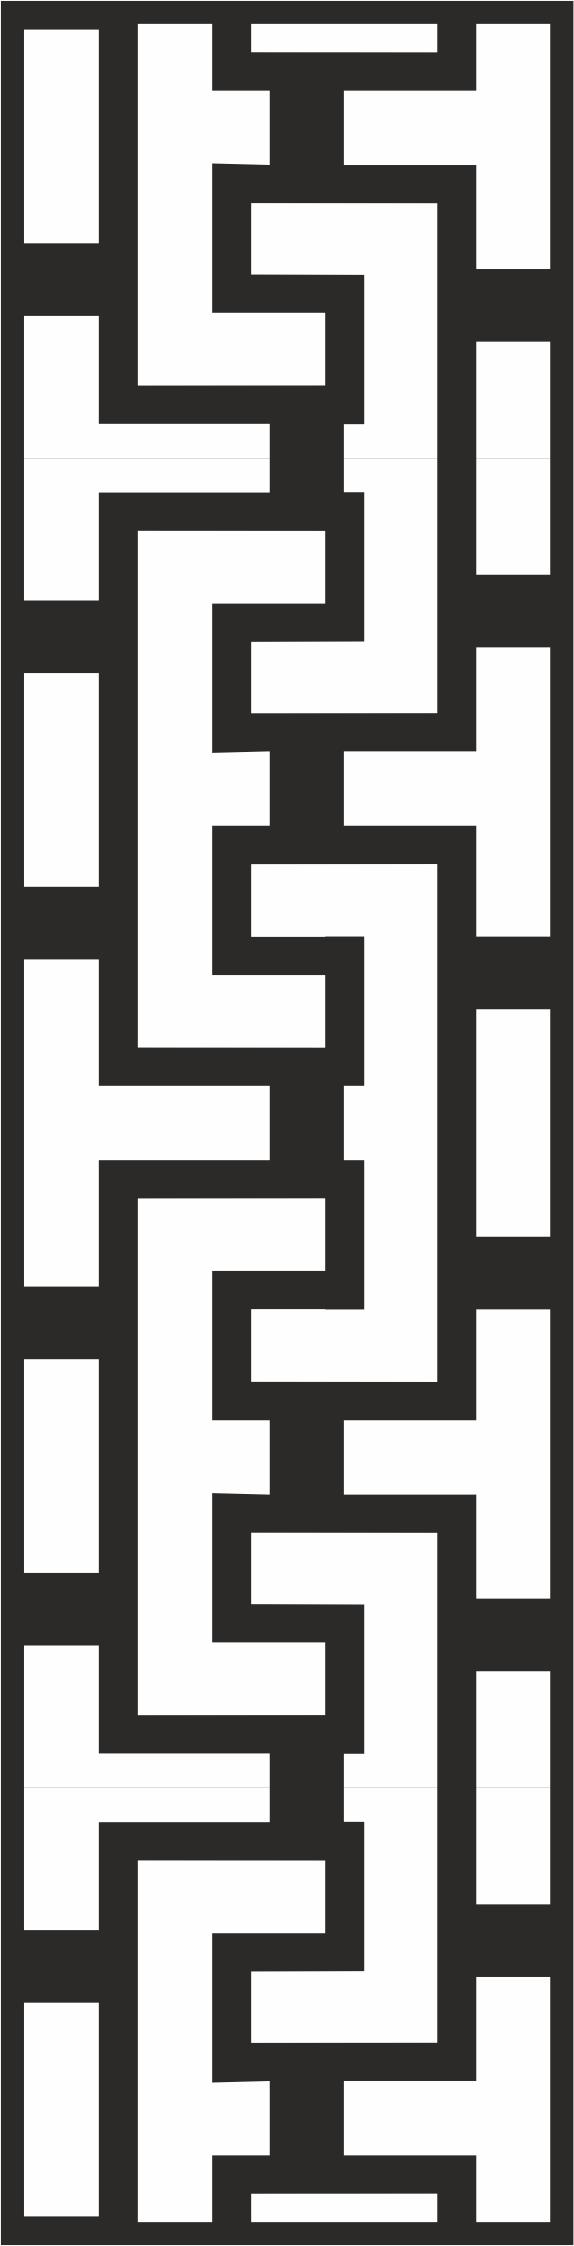 Geometric Line Frame Border Design Free CDR Vectors Art